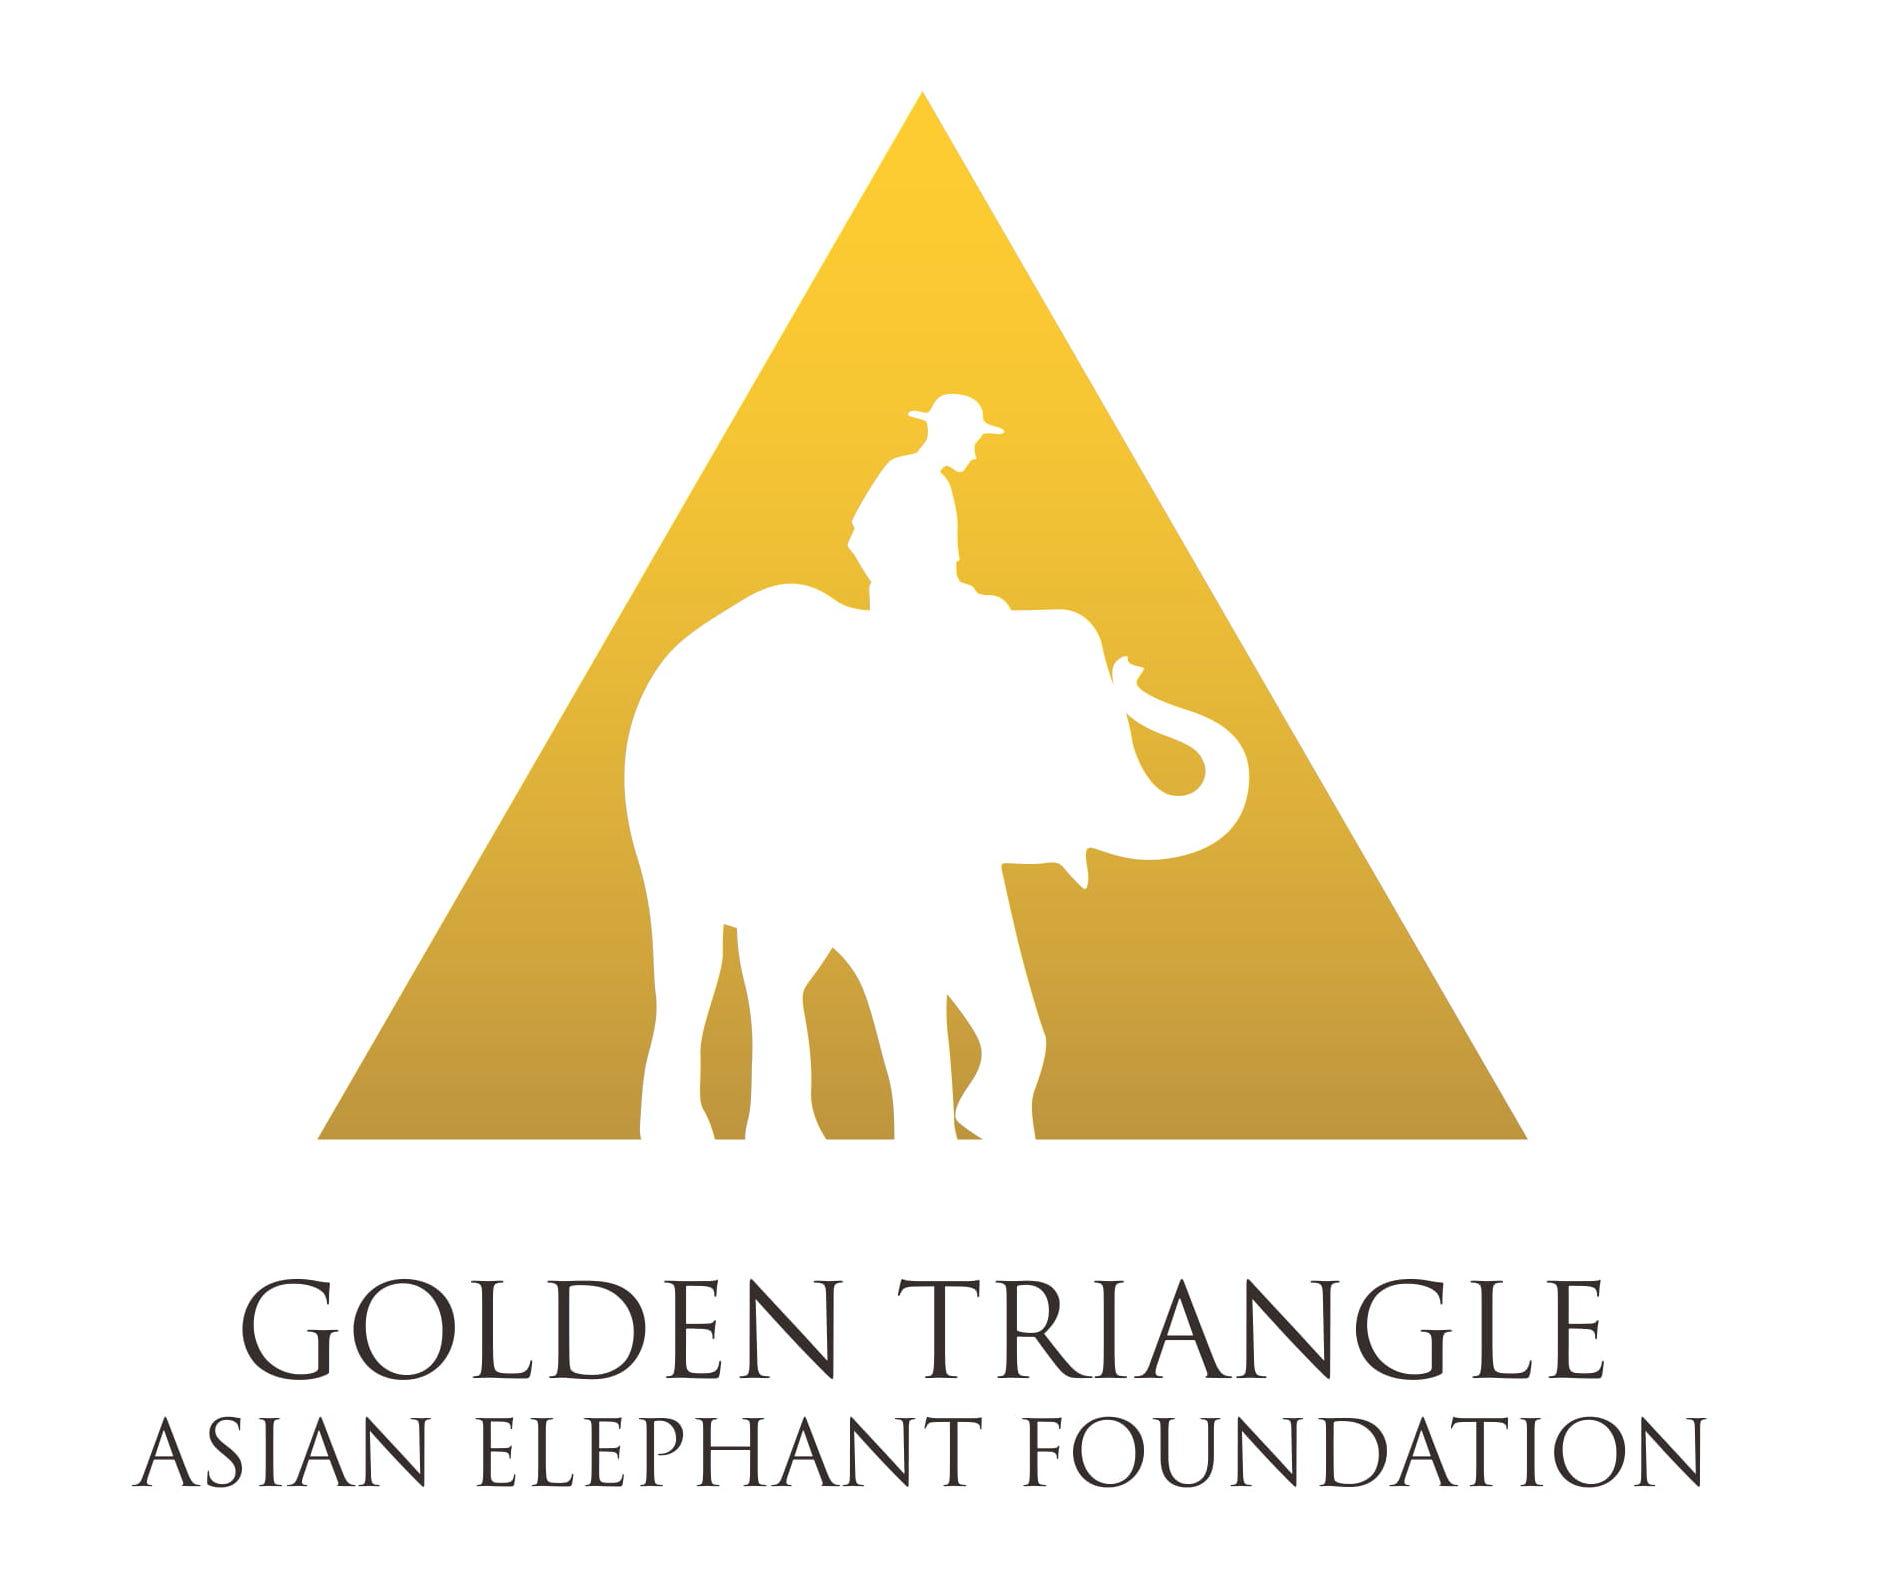 The Golden Triangle Asian Elephant Foundation  logo